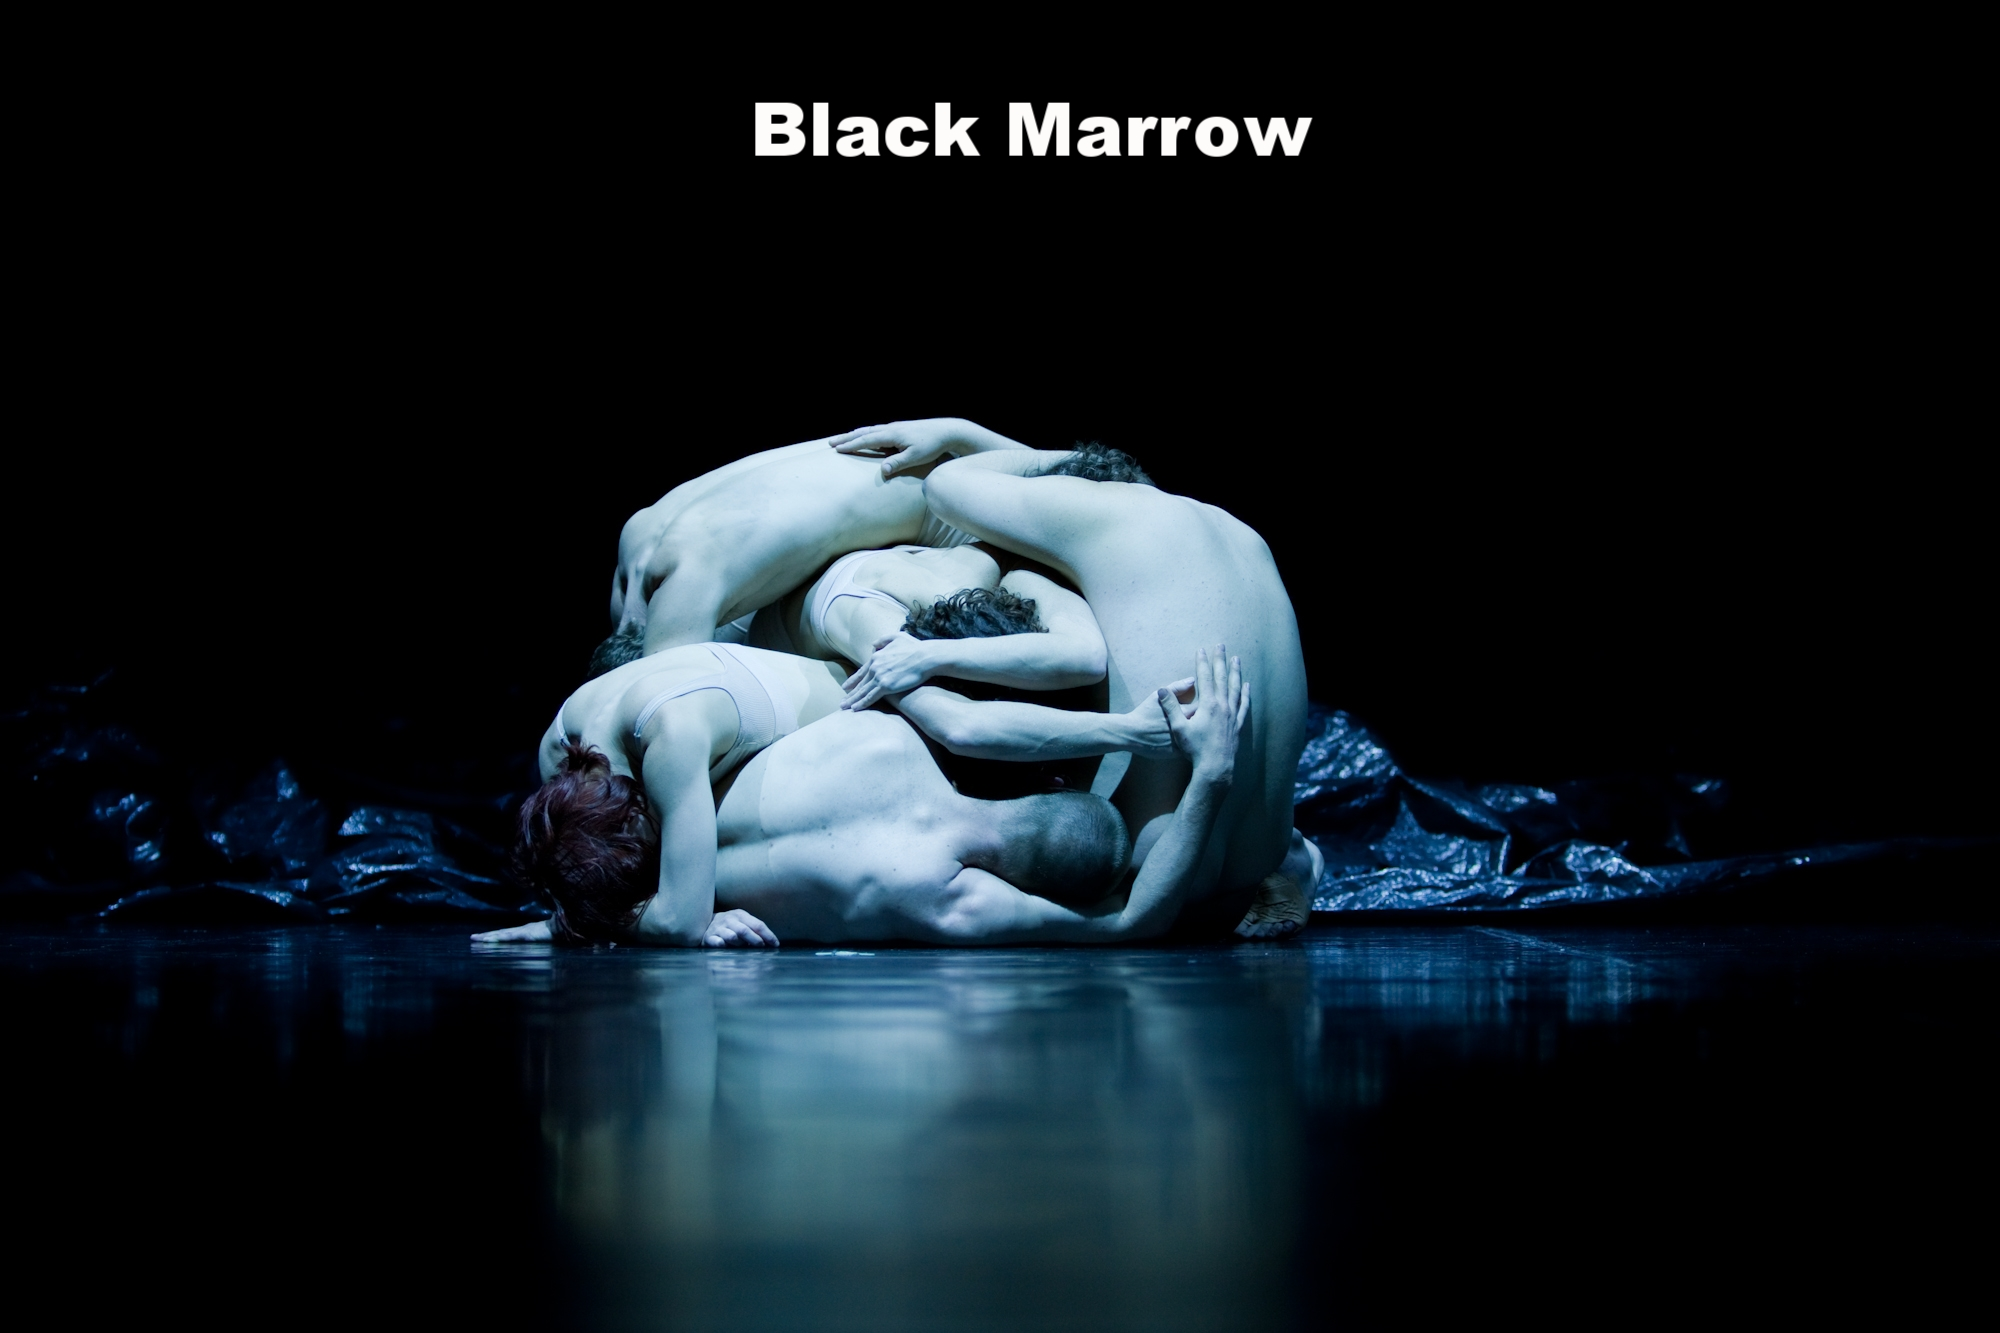 Black-Marrow_CR_Proud-Mother-Pictures.jpg